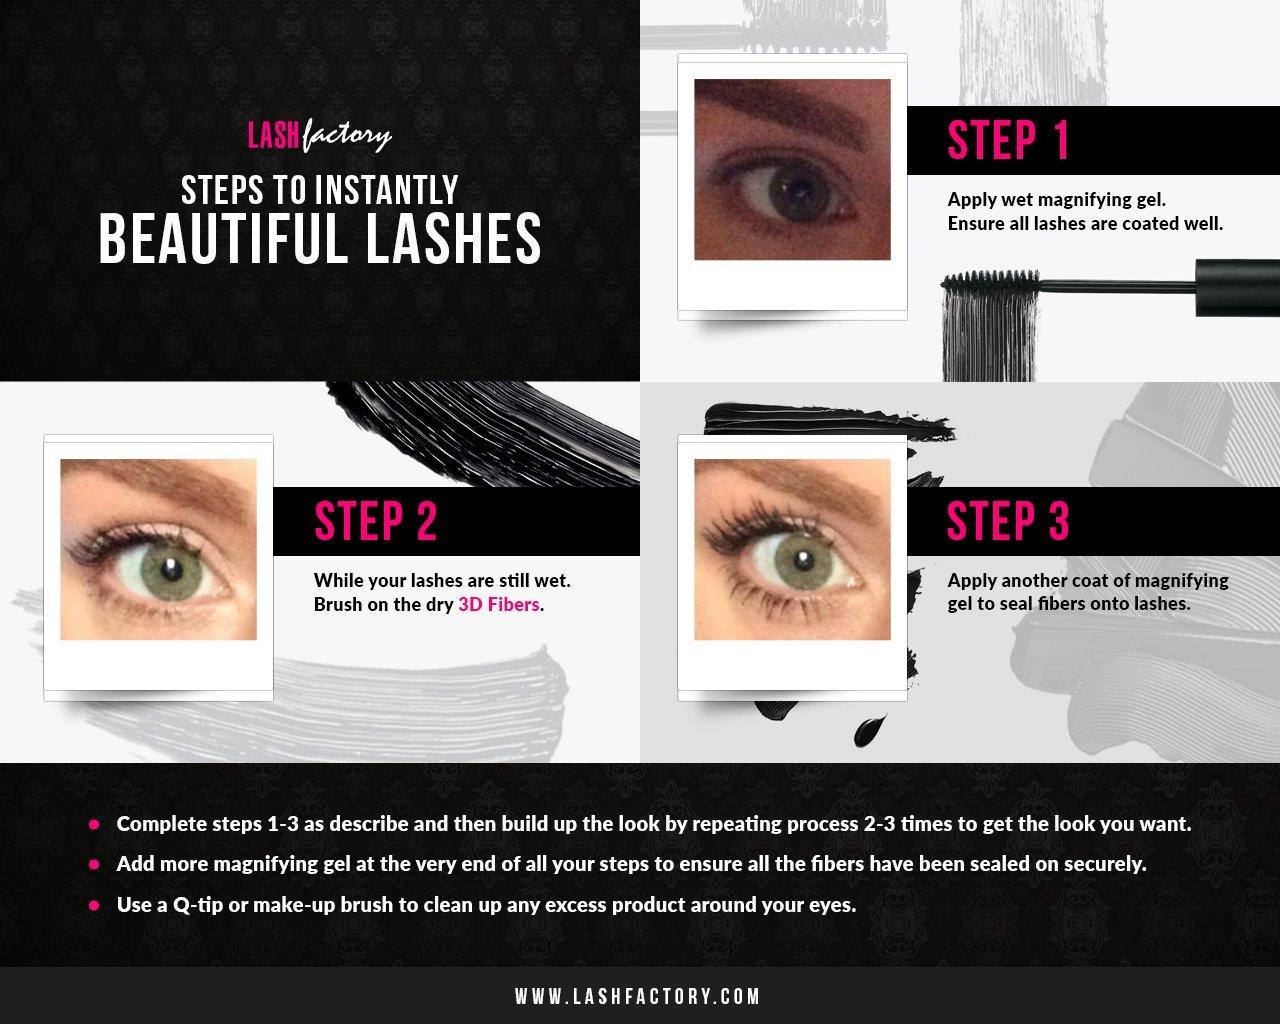 6d9465ca047 Amazon.com : 3D Fiber Mascara by Lash Factory - Infinity 3D Fiber Lashes.  Waterproof & Volumizing, Simply The Best 3D Lashes, Unique Formula For Your  Makeup ...